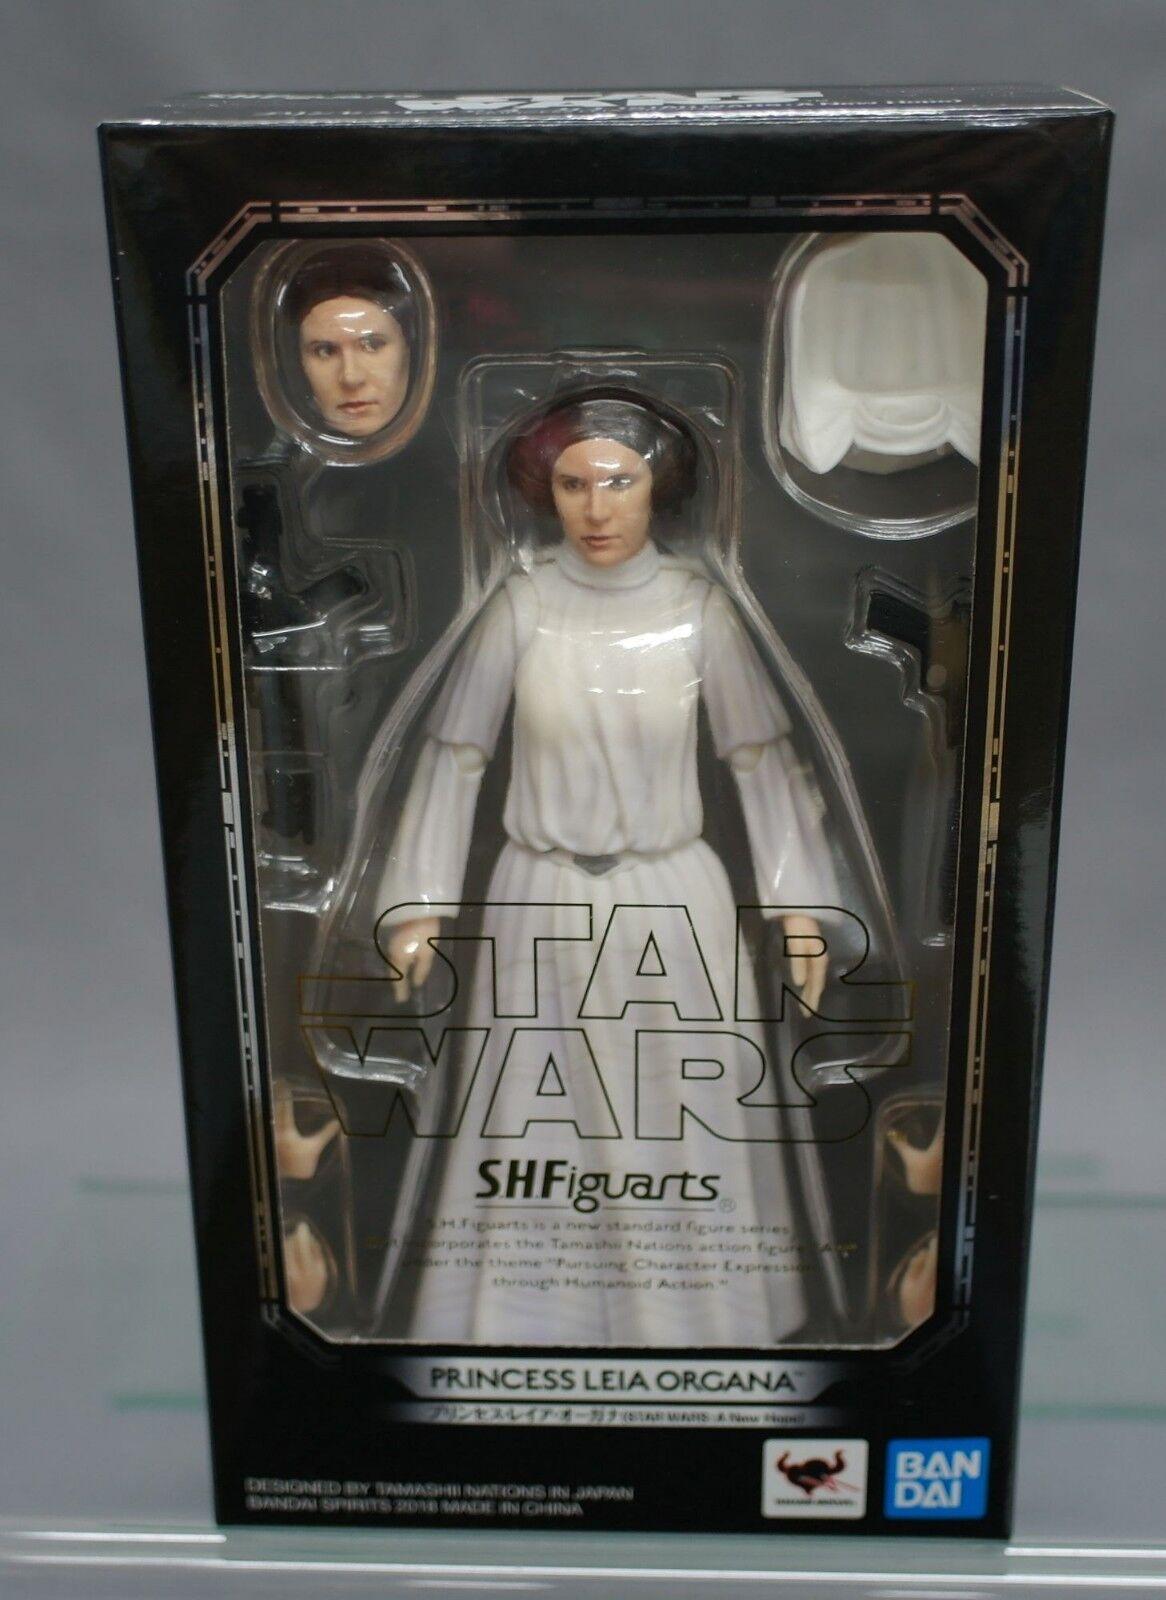 S.H. Figuarts Leia Leia Leia Star Wars Princess Leia Organa (A New Hope) Bandai NEW b524d4